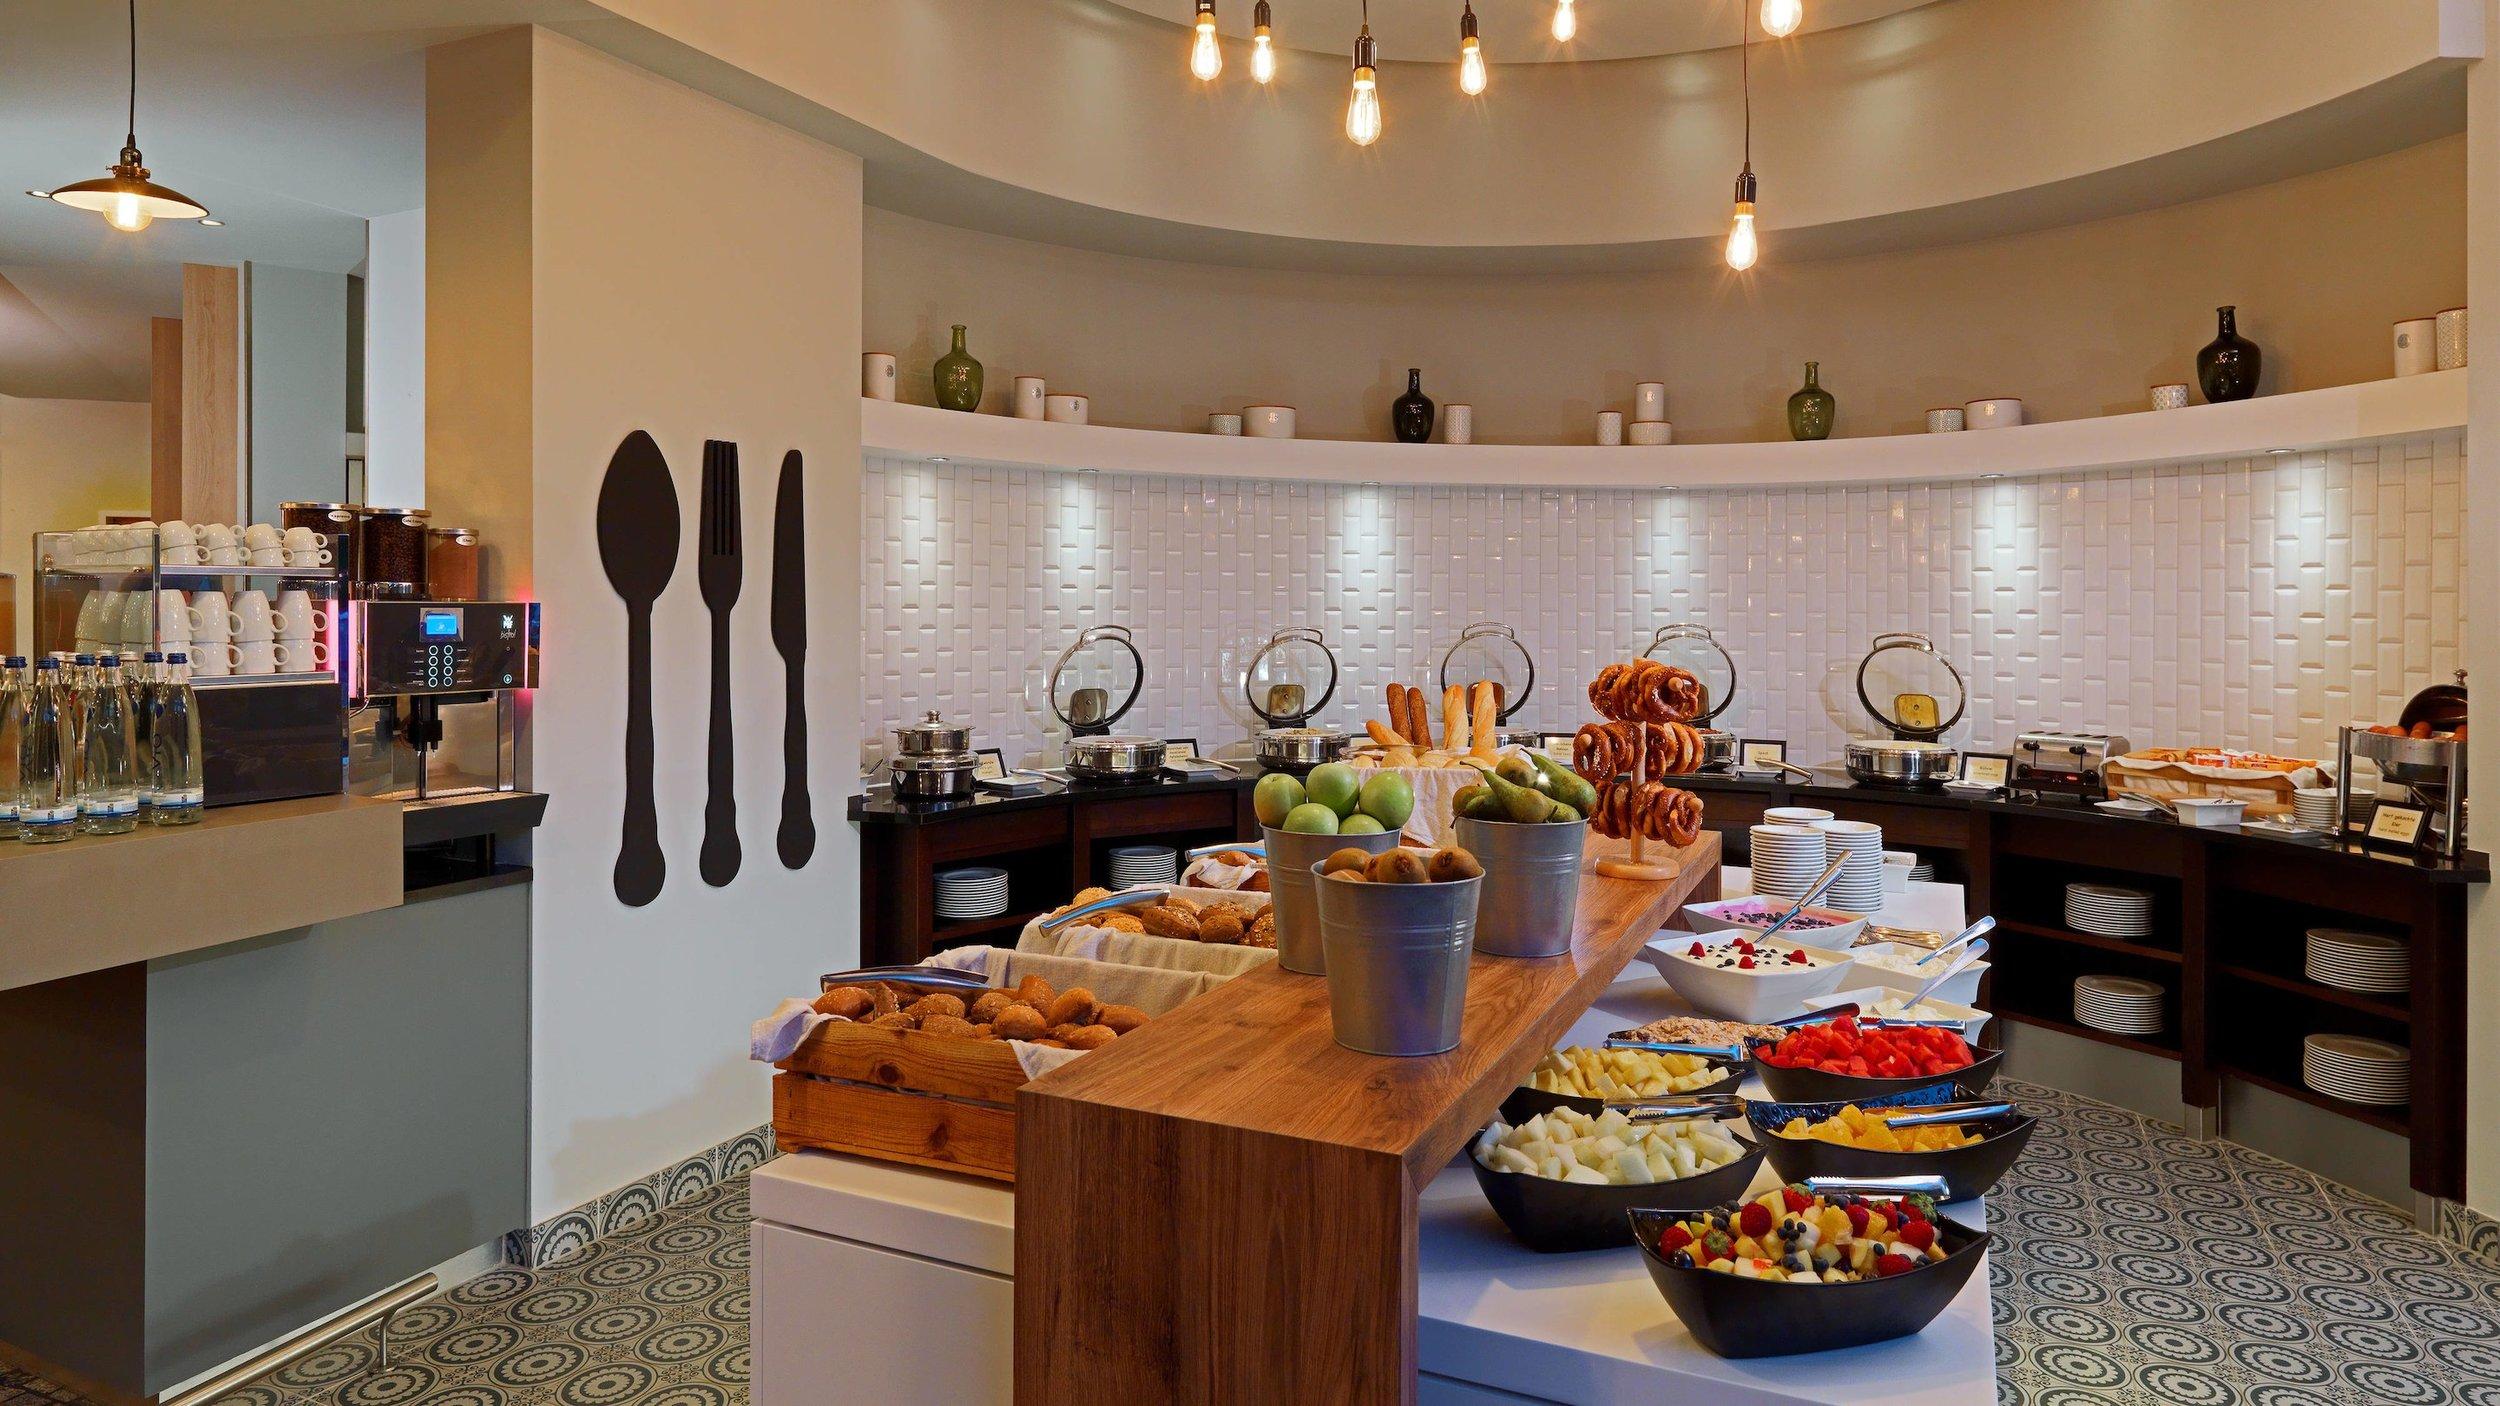 bermt-breakfast-0076-hor-wide.jpg